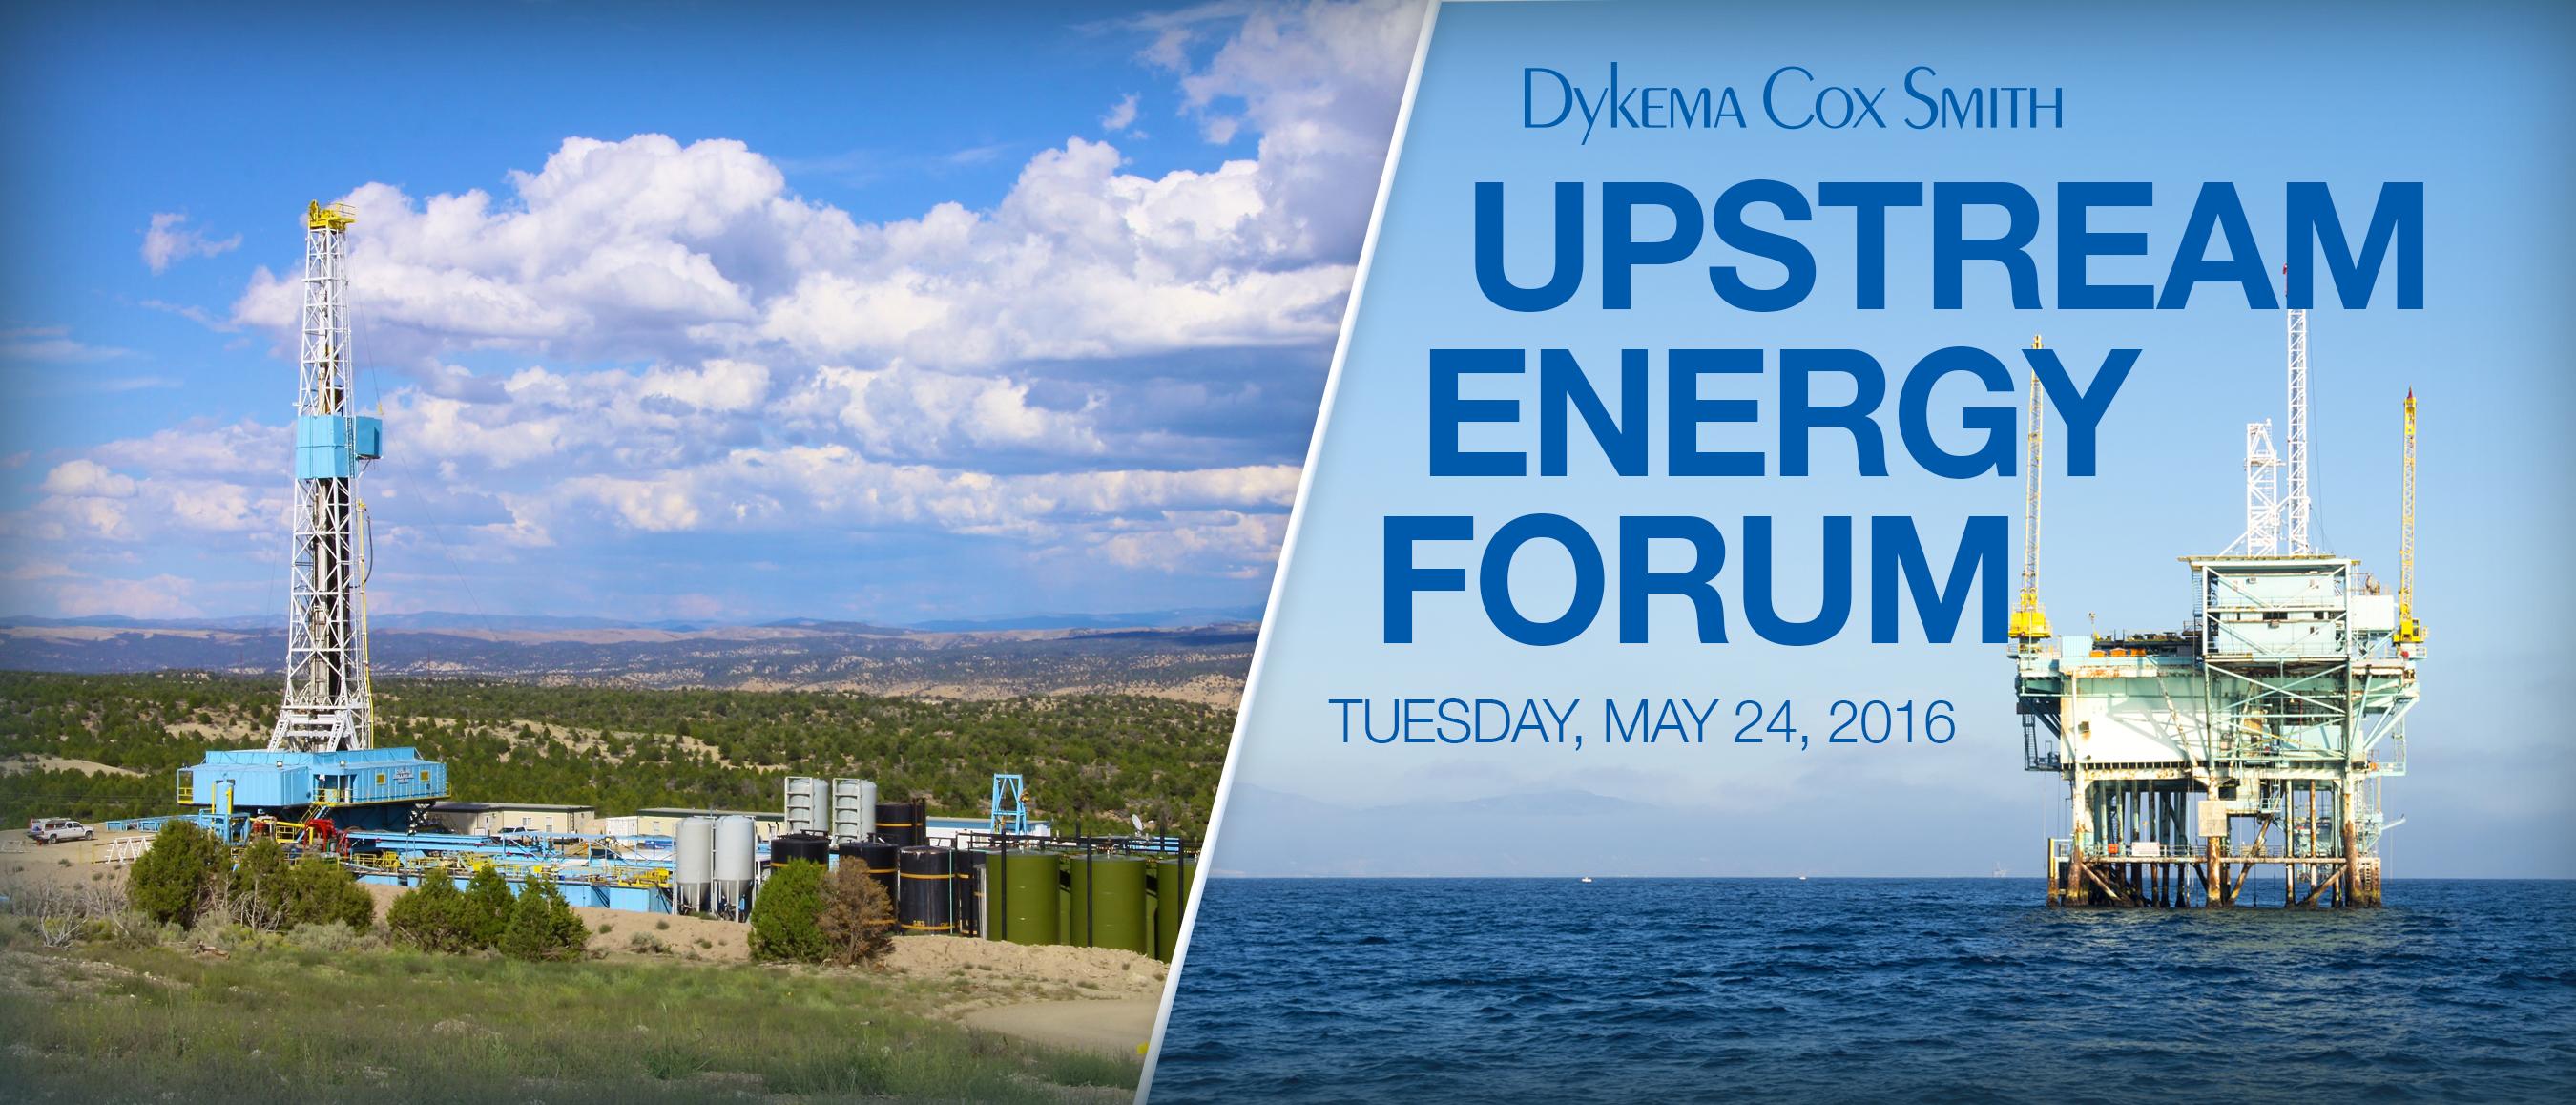 Dykema Cox Smith's Upstream Energy Forum